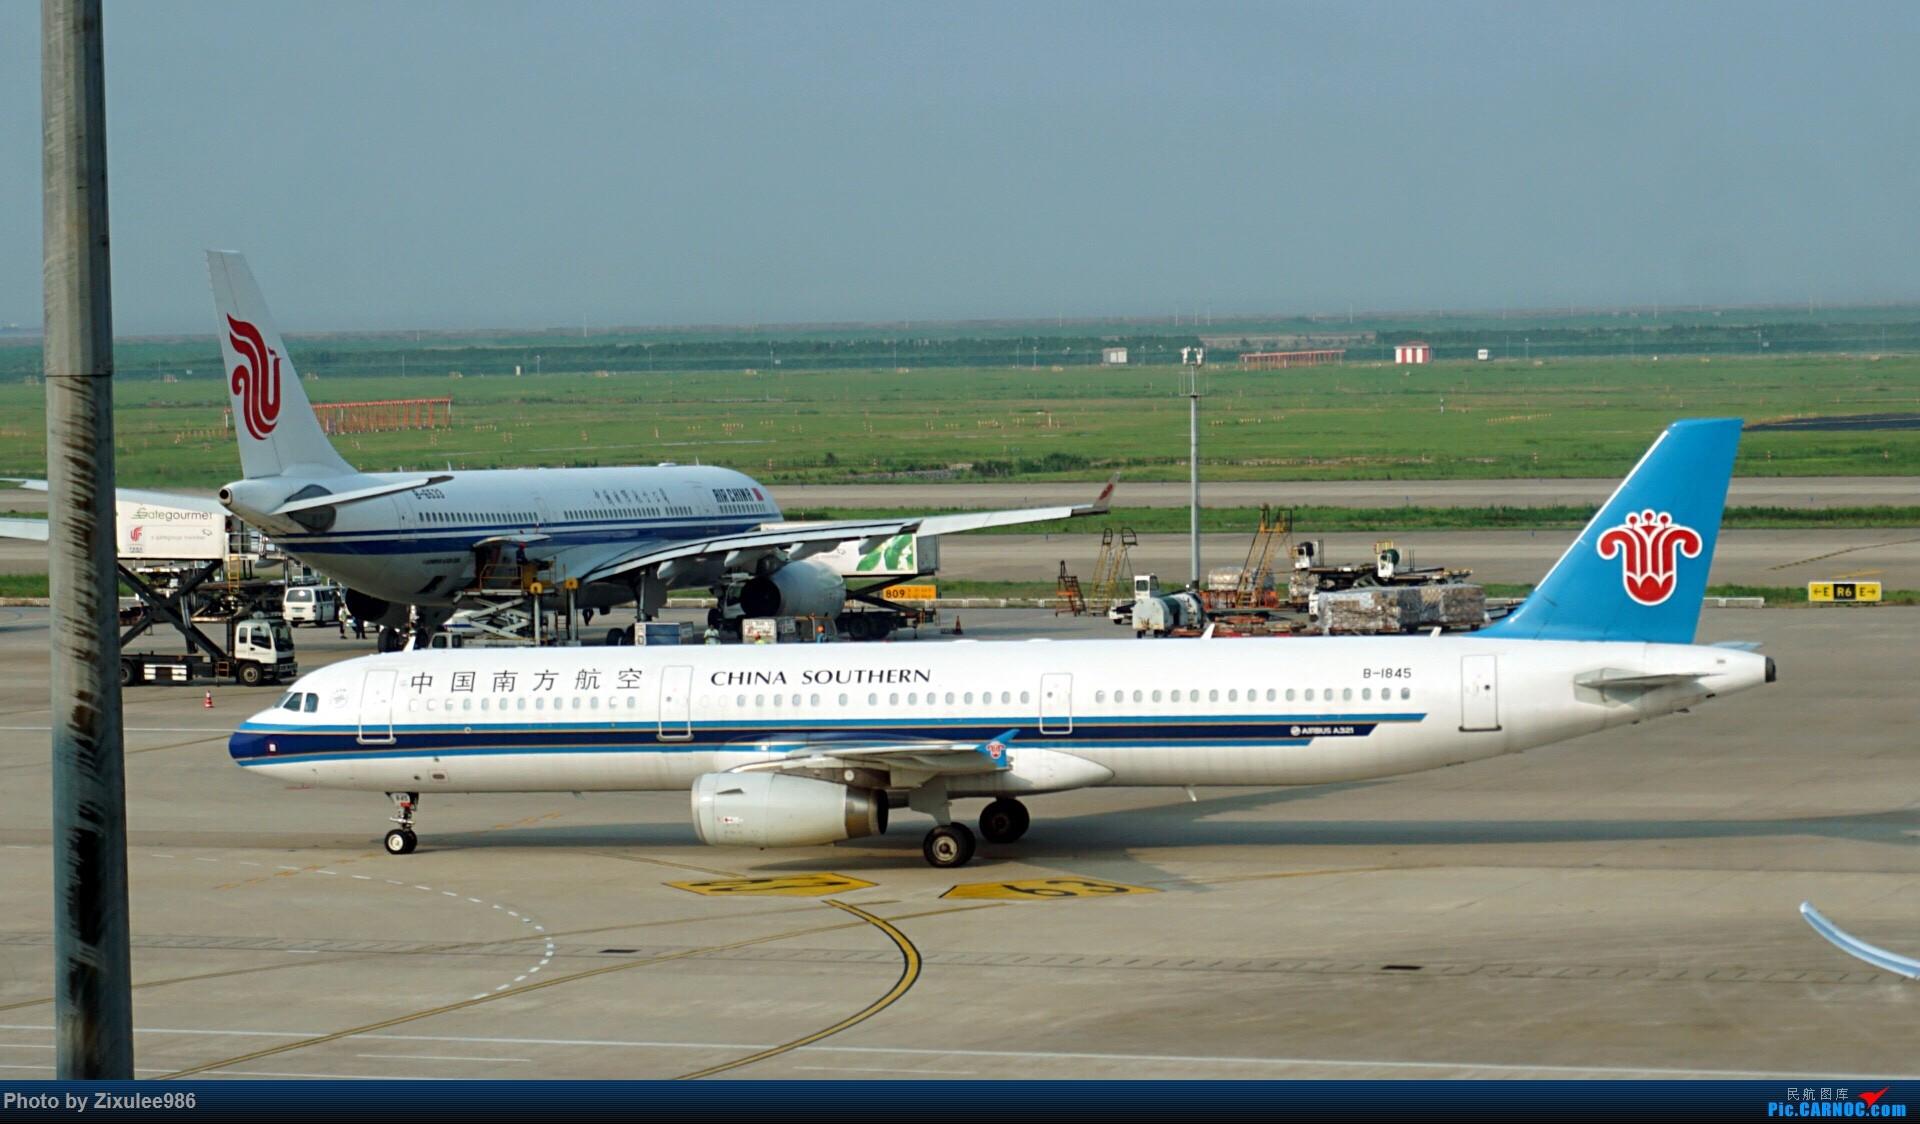 Re:[原创]加拿大21日游学之旅(一)~JJN-PVG-YYZ..(内含flightlog)~第一次发游记~多图缓更请谅解 AIRBUS A321-200 B-1845 中国上海浦东国际机场